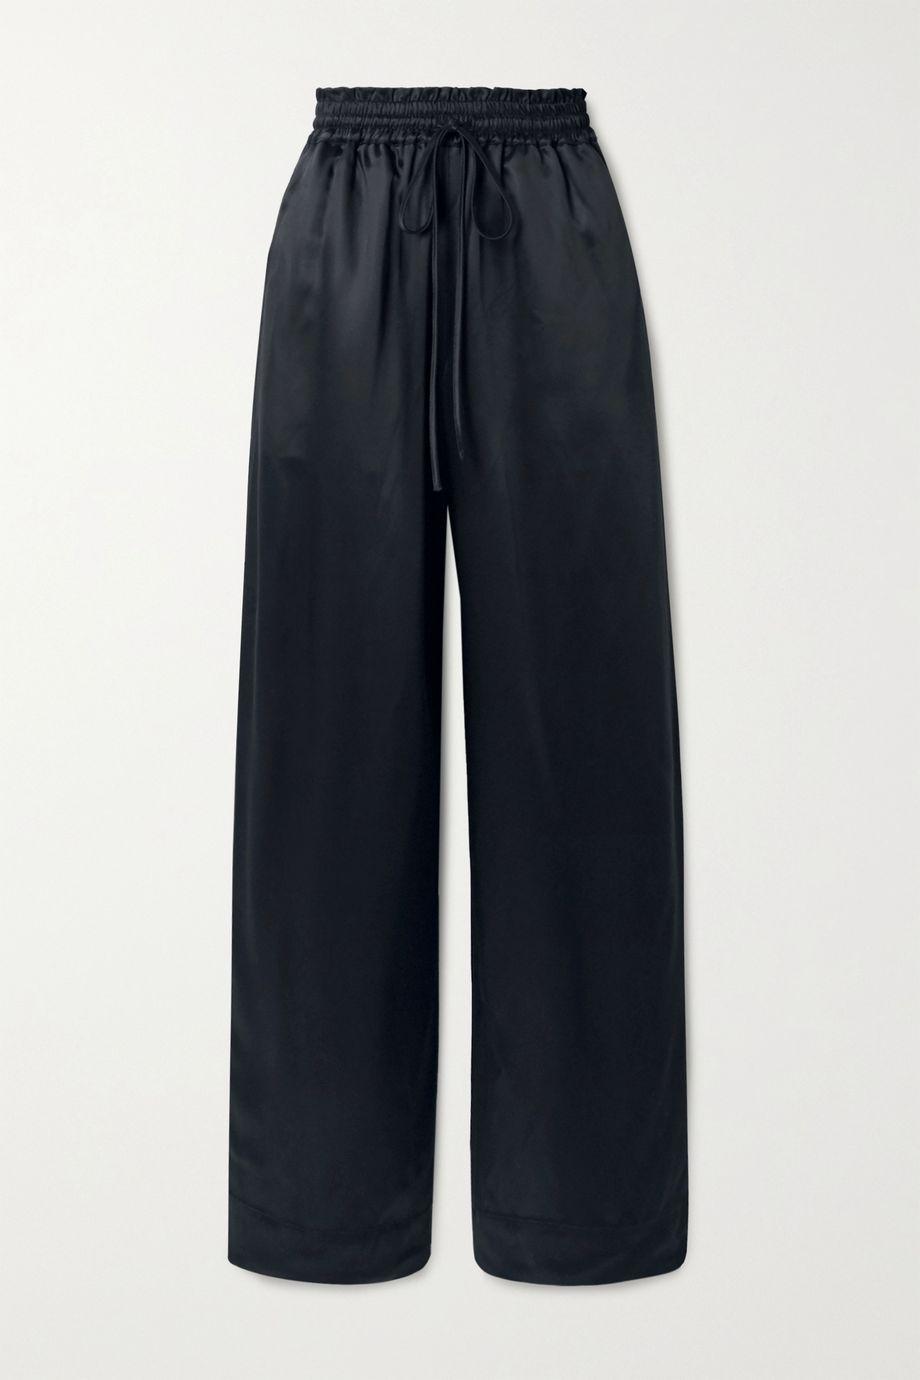 Co Duchesse-satin wide-leg pants